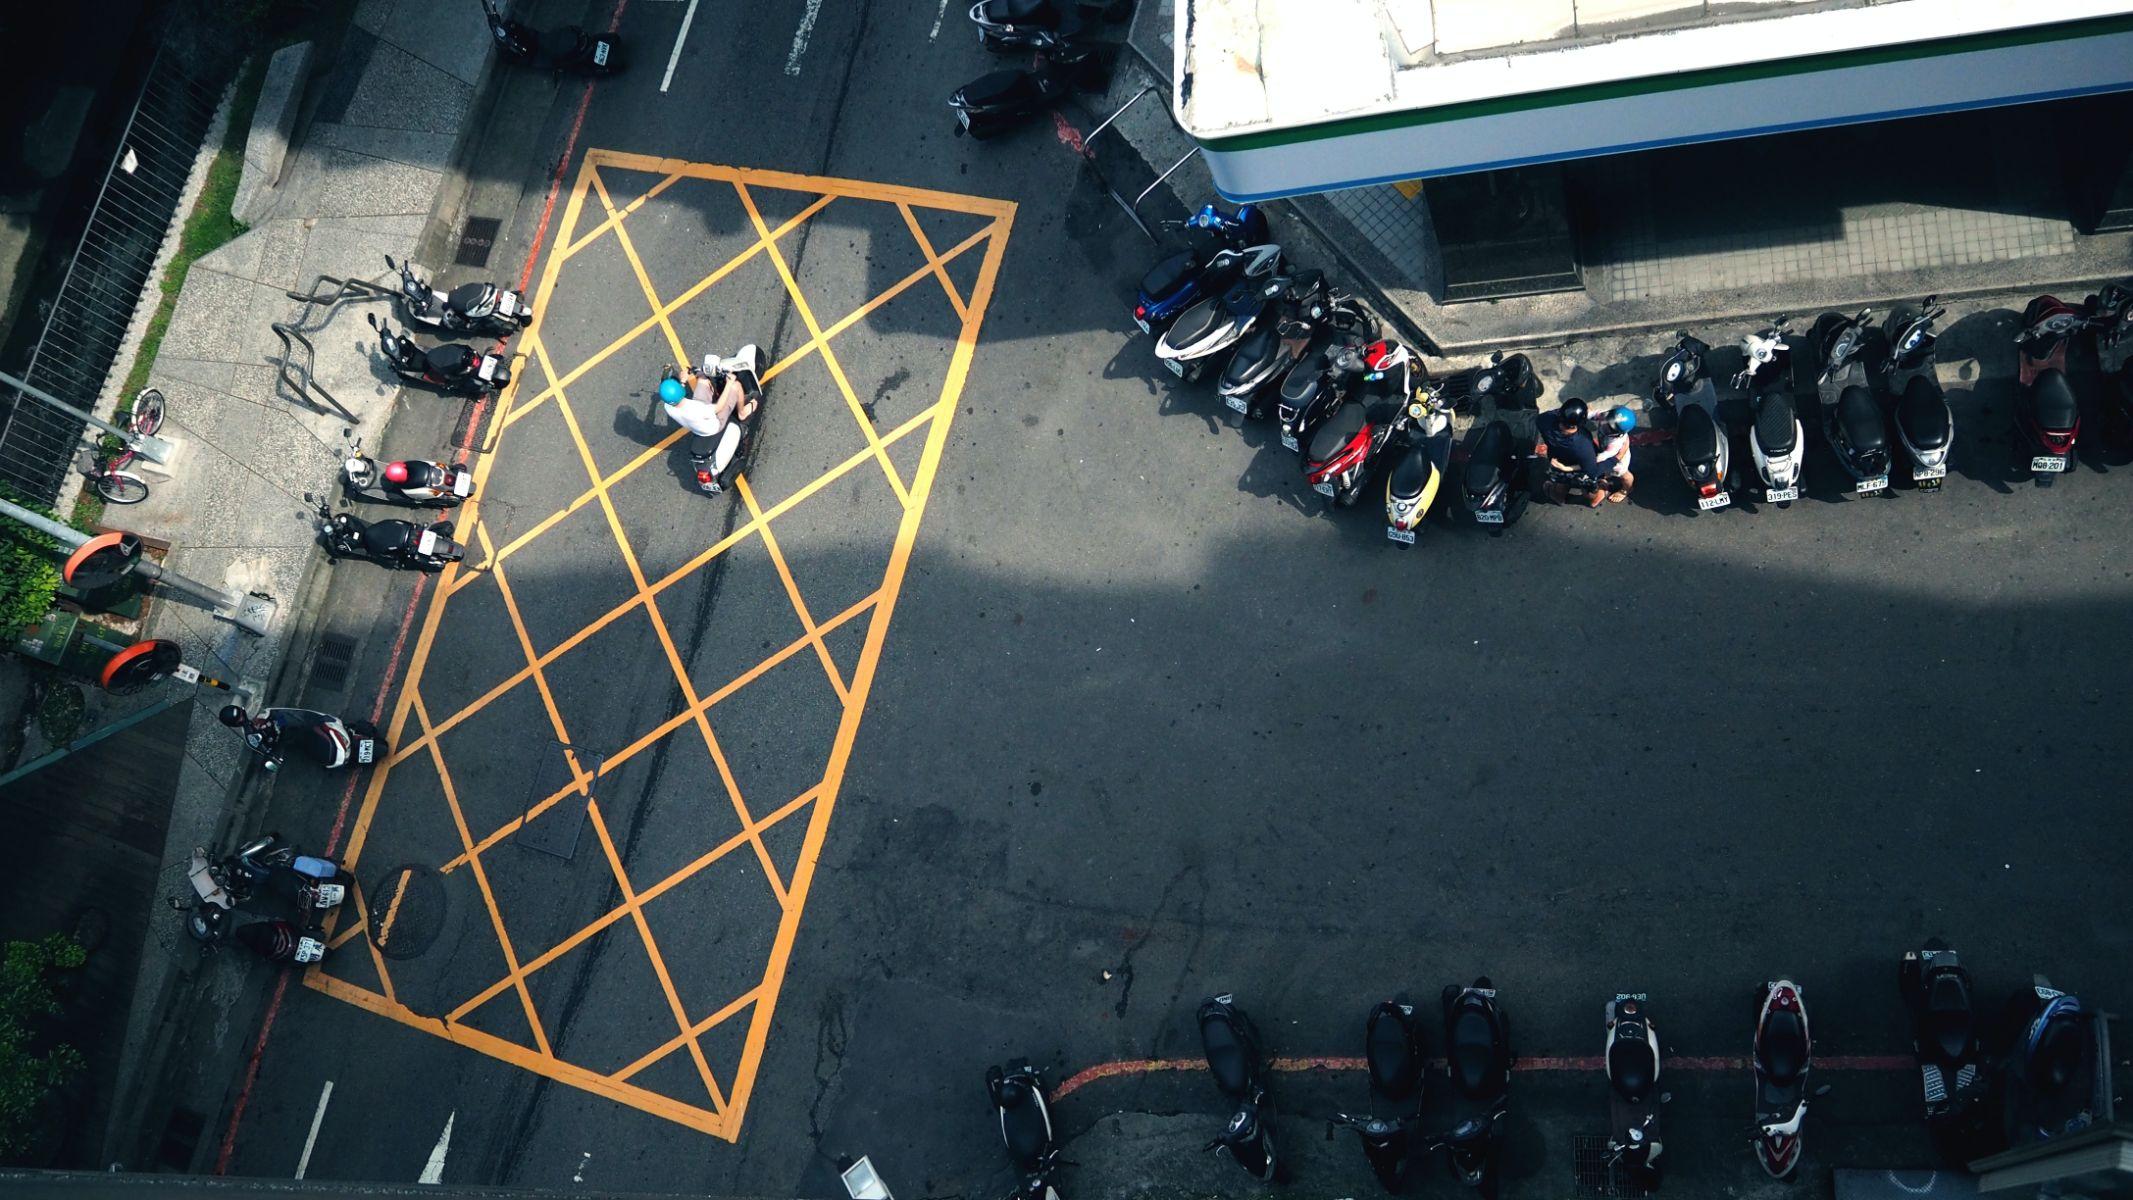 Motorcycle fleet